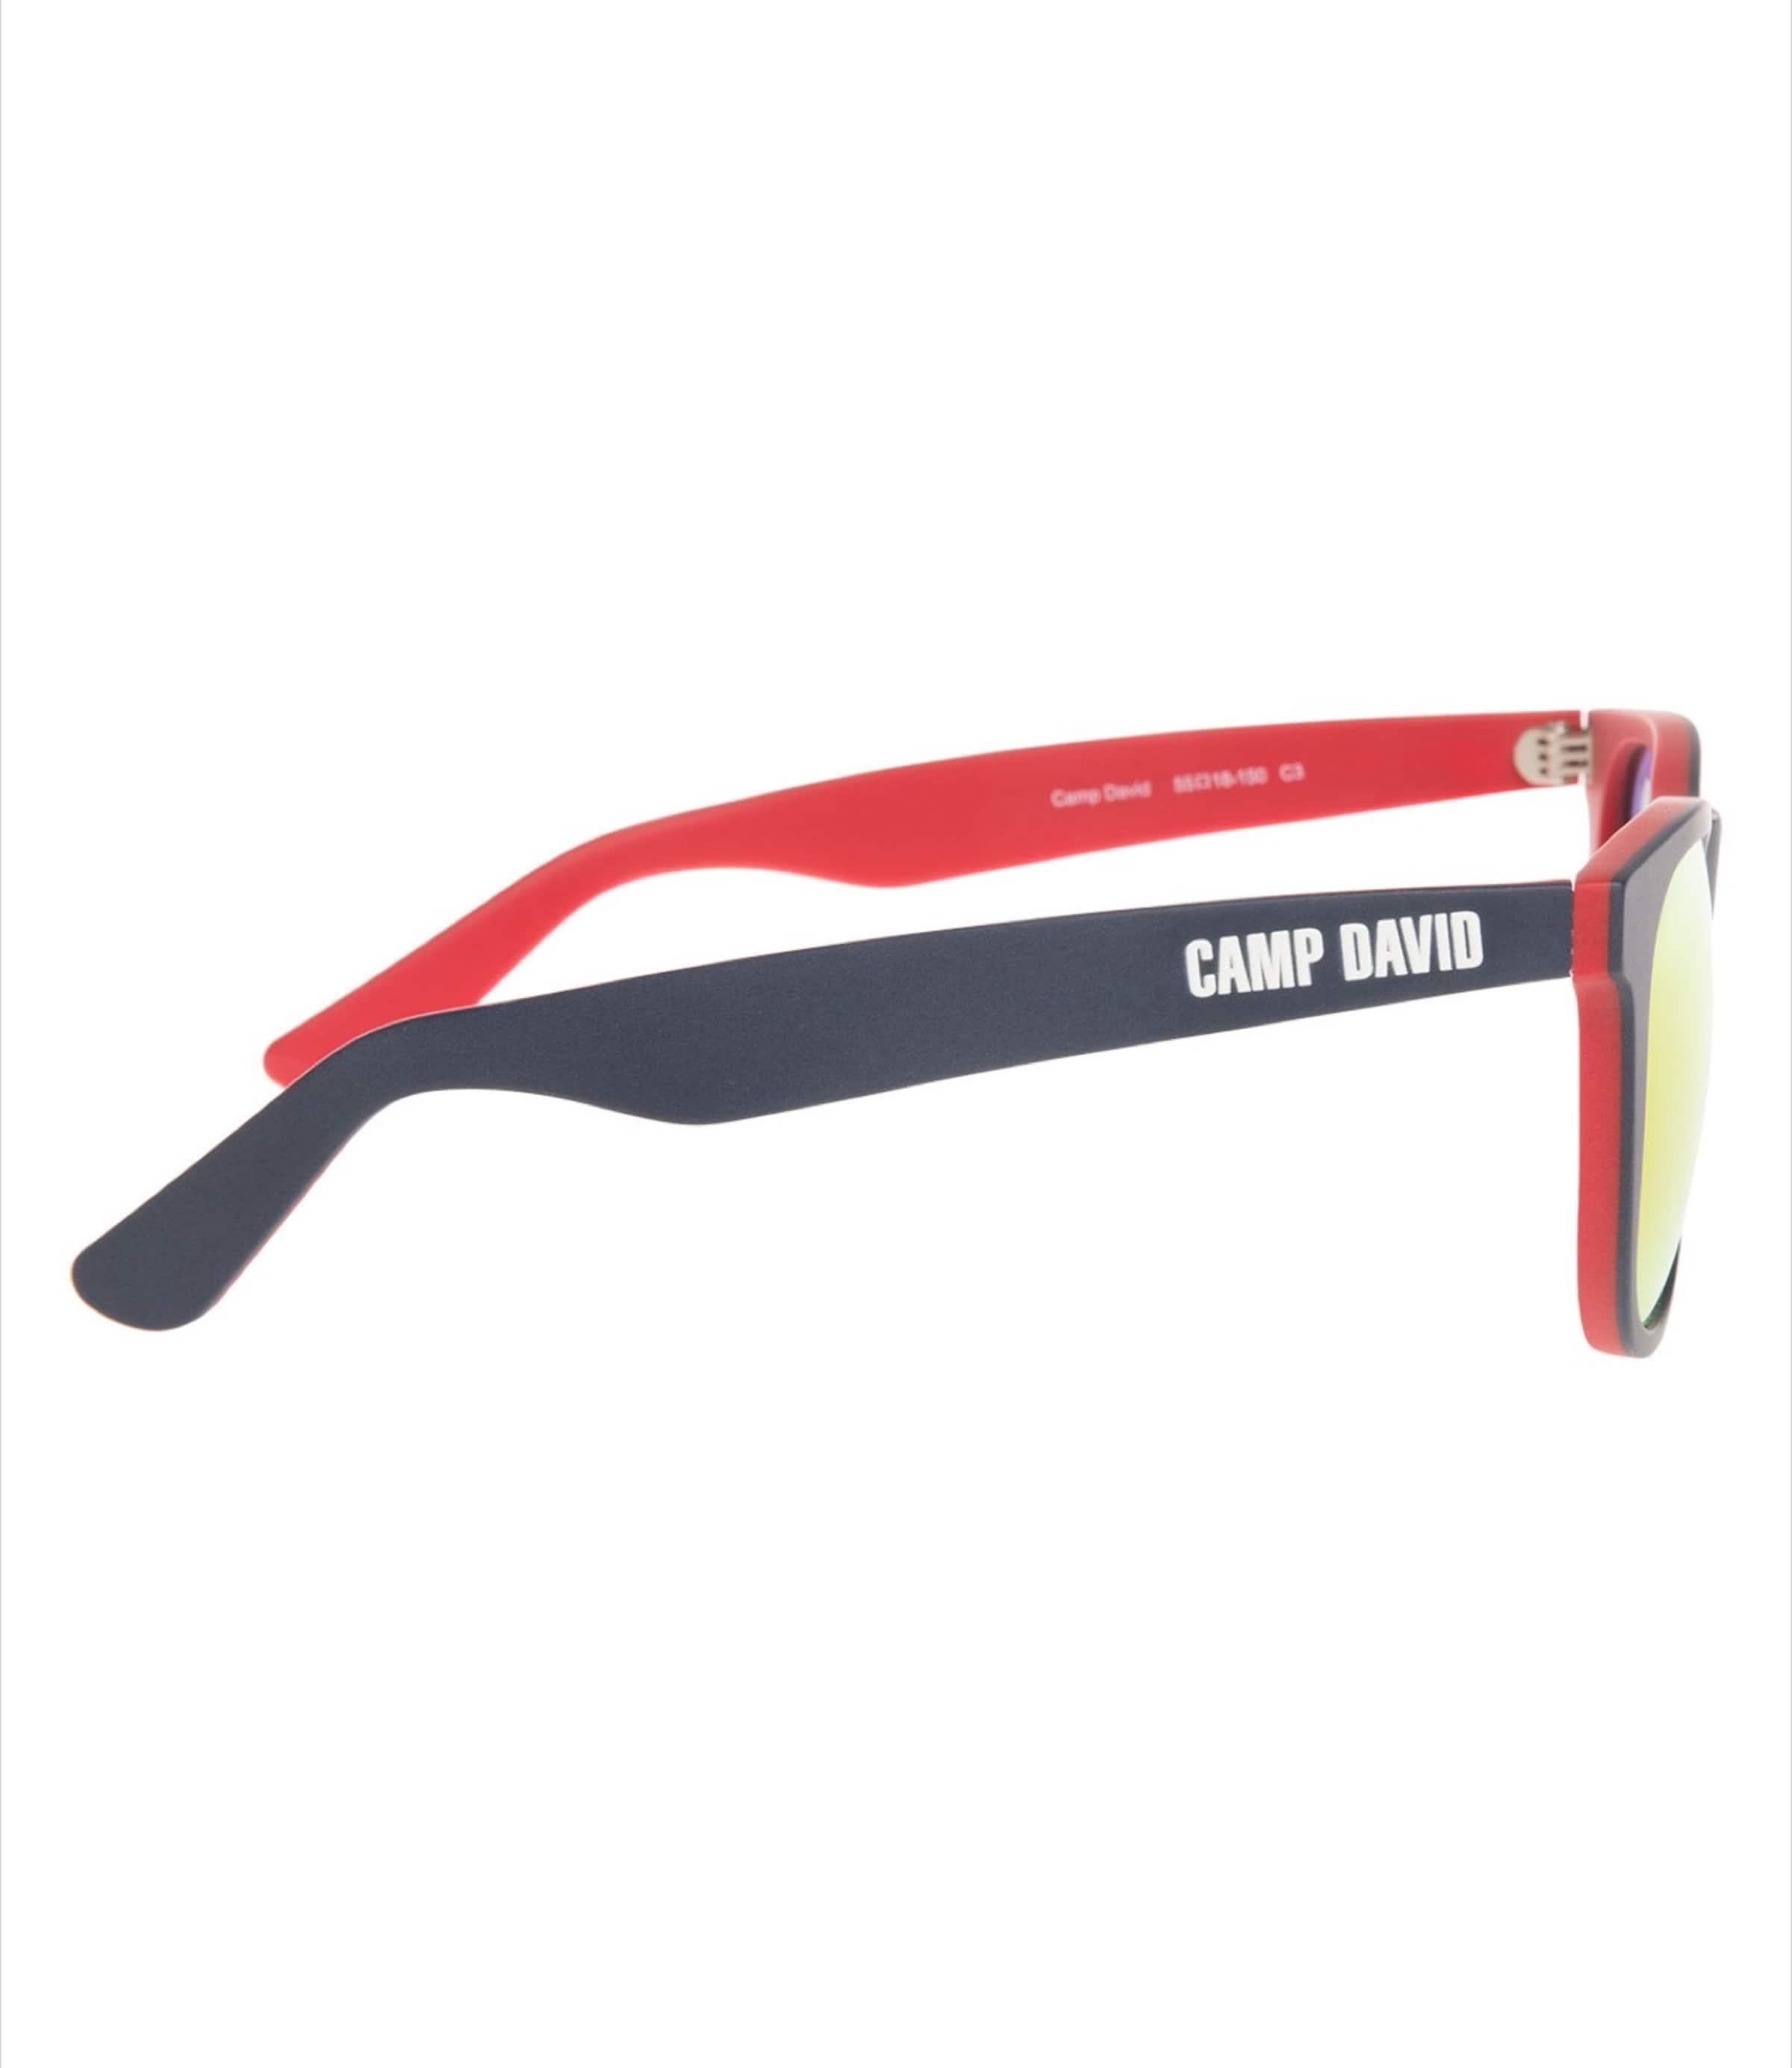 Sonnenbrille In Sonnenbrille NavyRot In Camp Camp Sonnenbrille NavyRot David Camp David David c3TlF1KJ